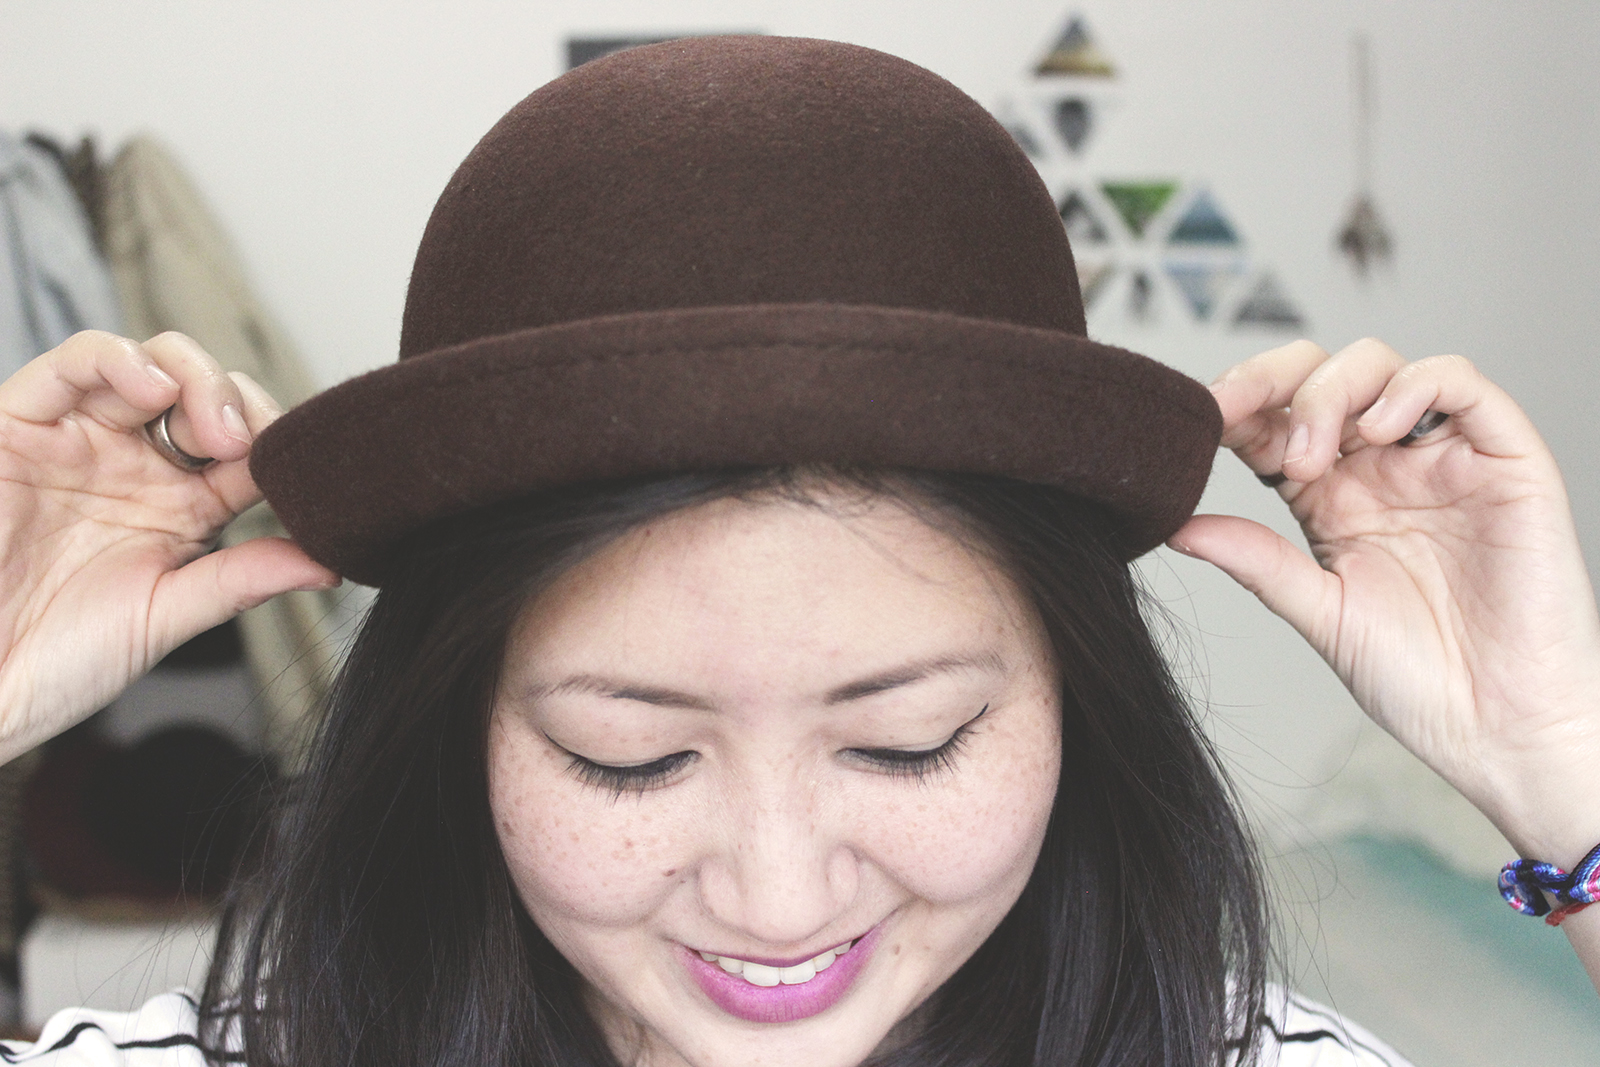 Ajustando chapéu cabeça